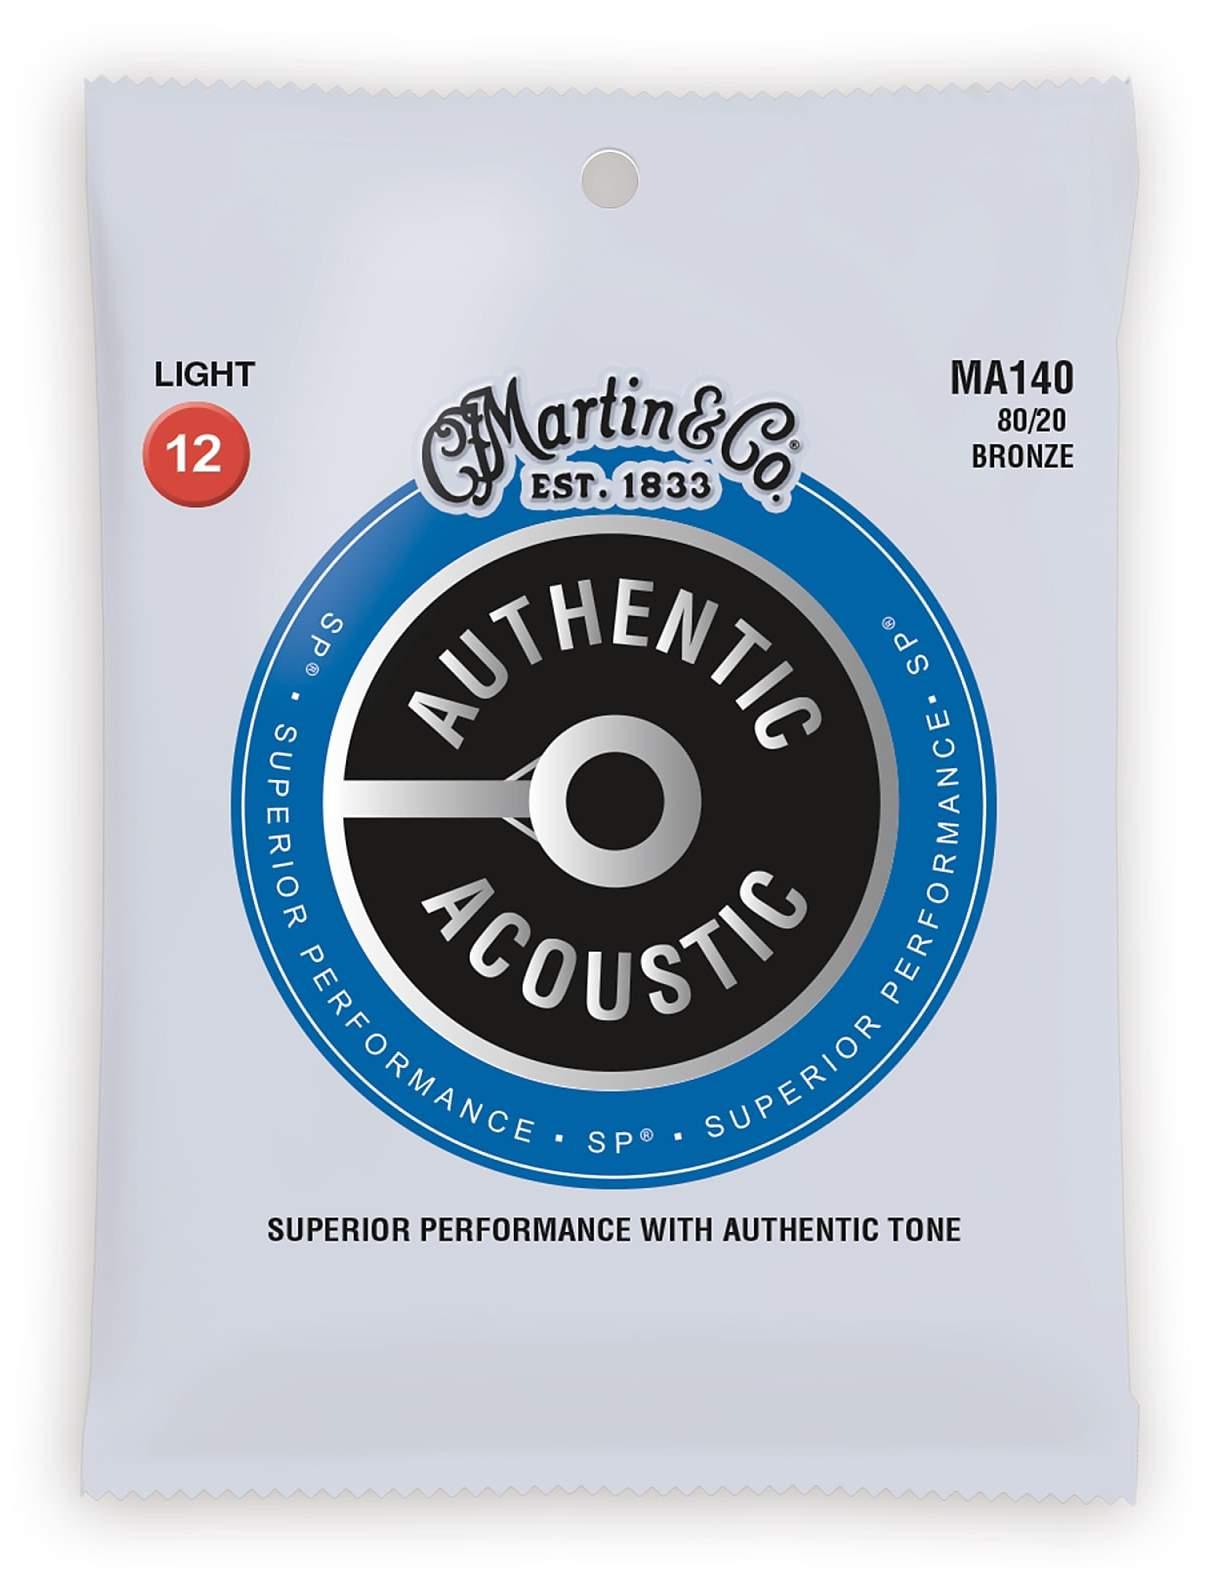 Martin Guitars MARTIN Authentic SP 80/20 Bronze Light 12